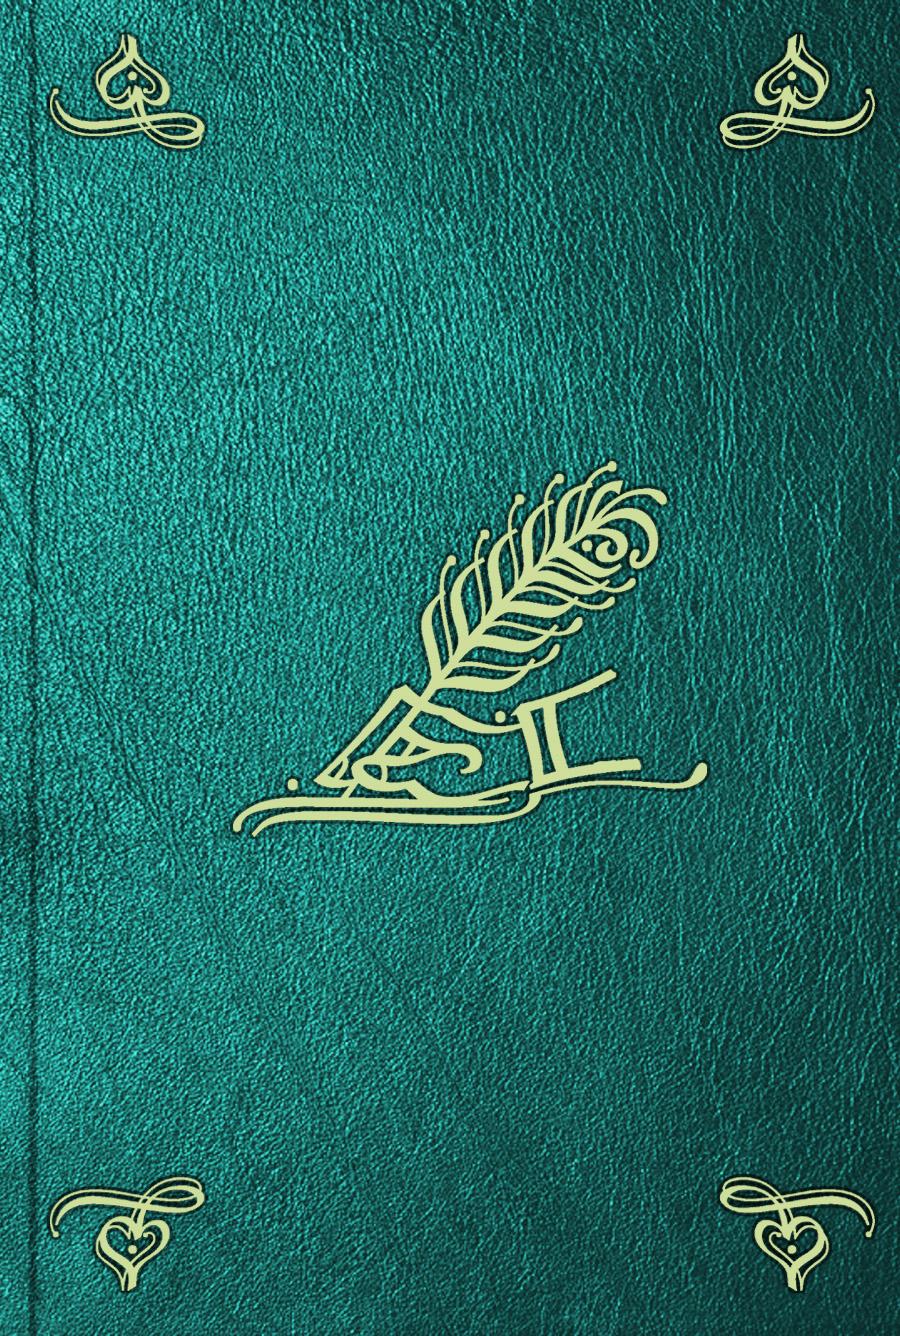 купить Frederique Wilhelmine Memoires de Frederique Sophie Wilhelmine, Margrave de Bareith, soeur de Frederic le Grand. T. 2 дешево